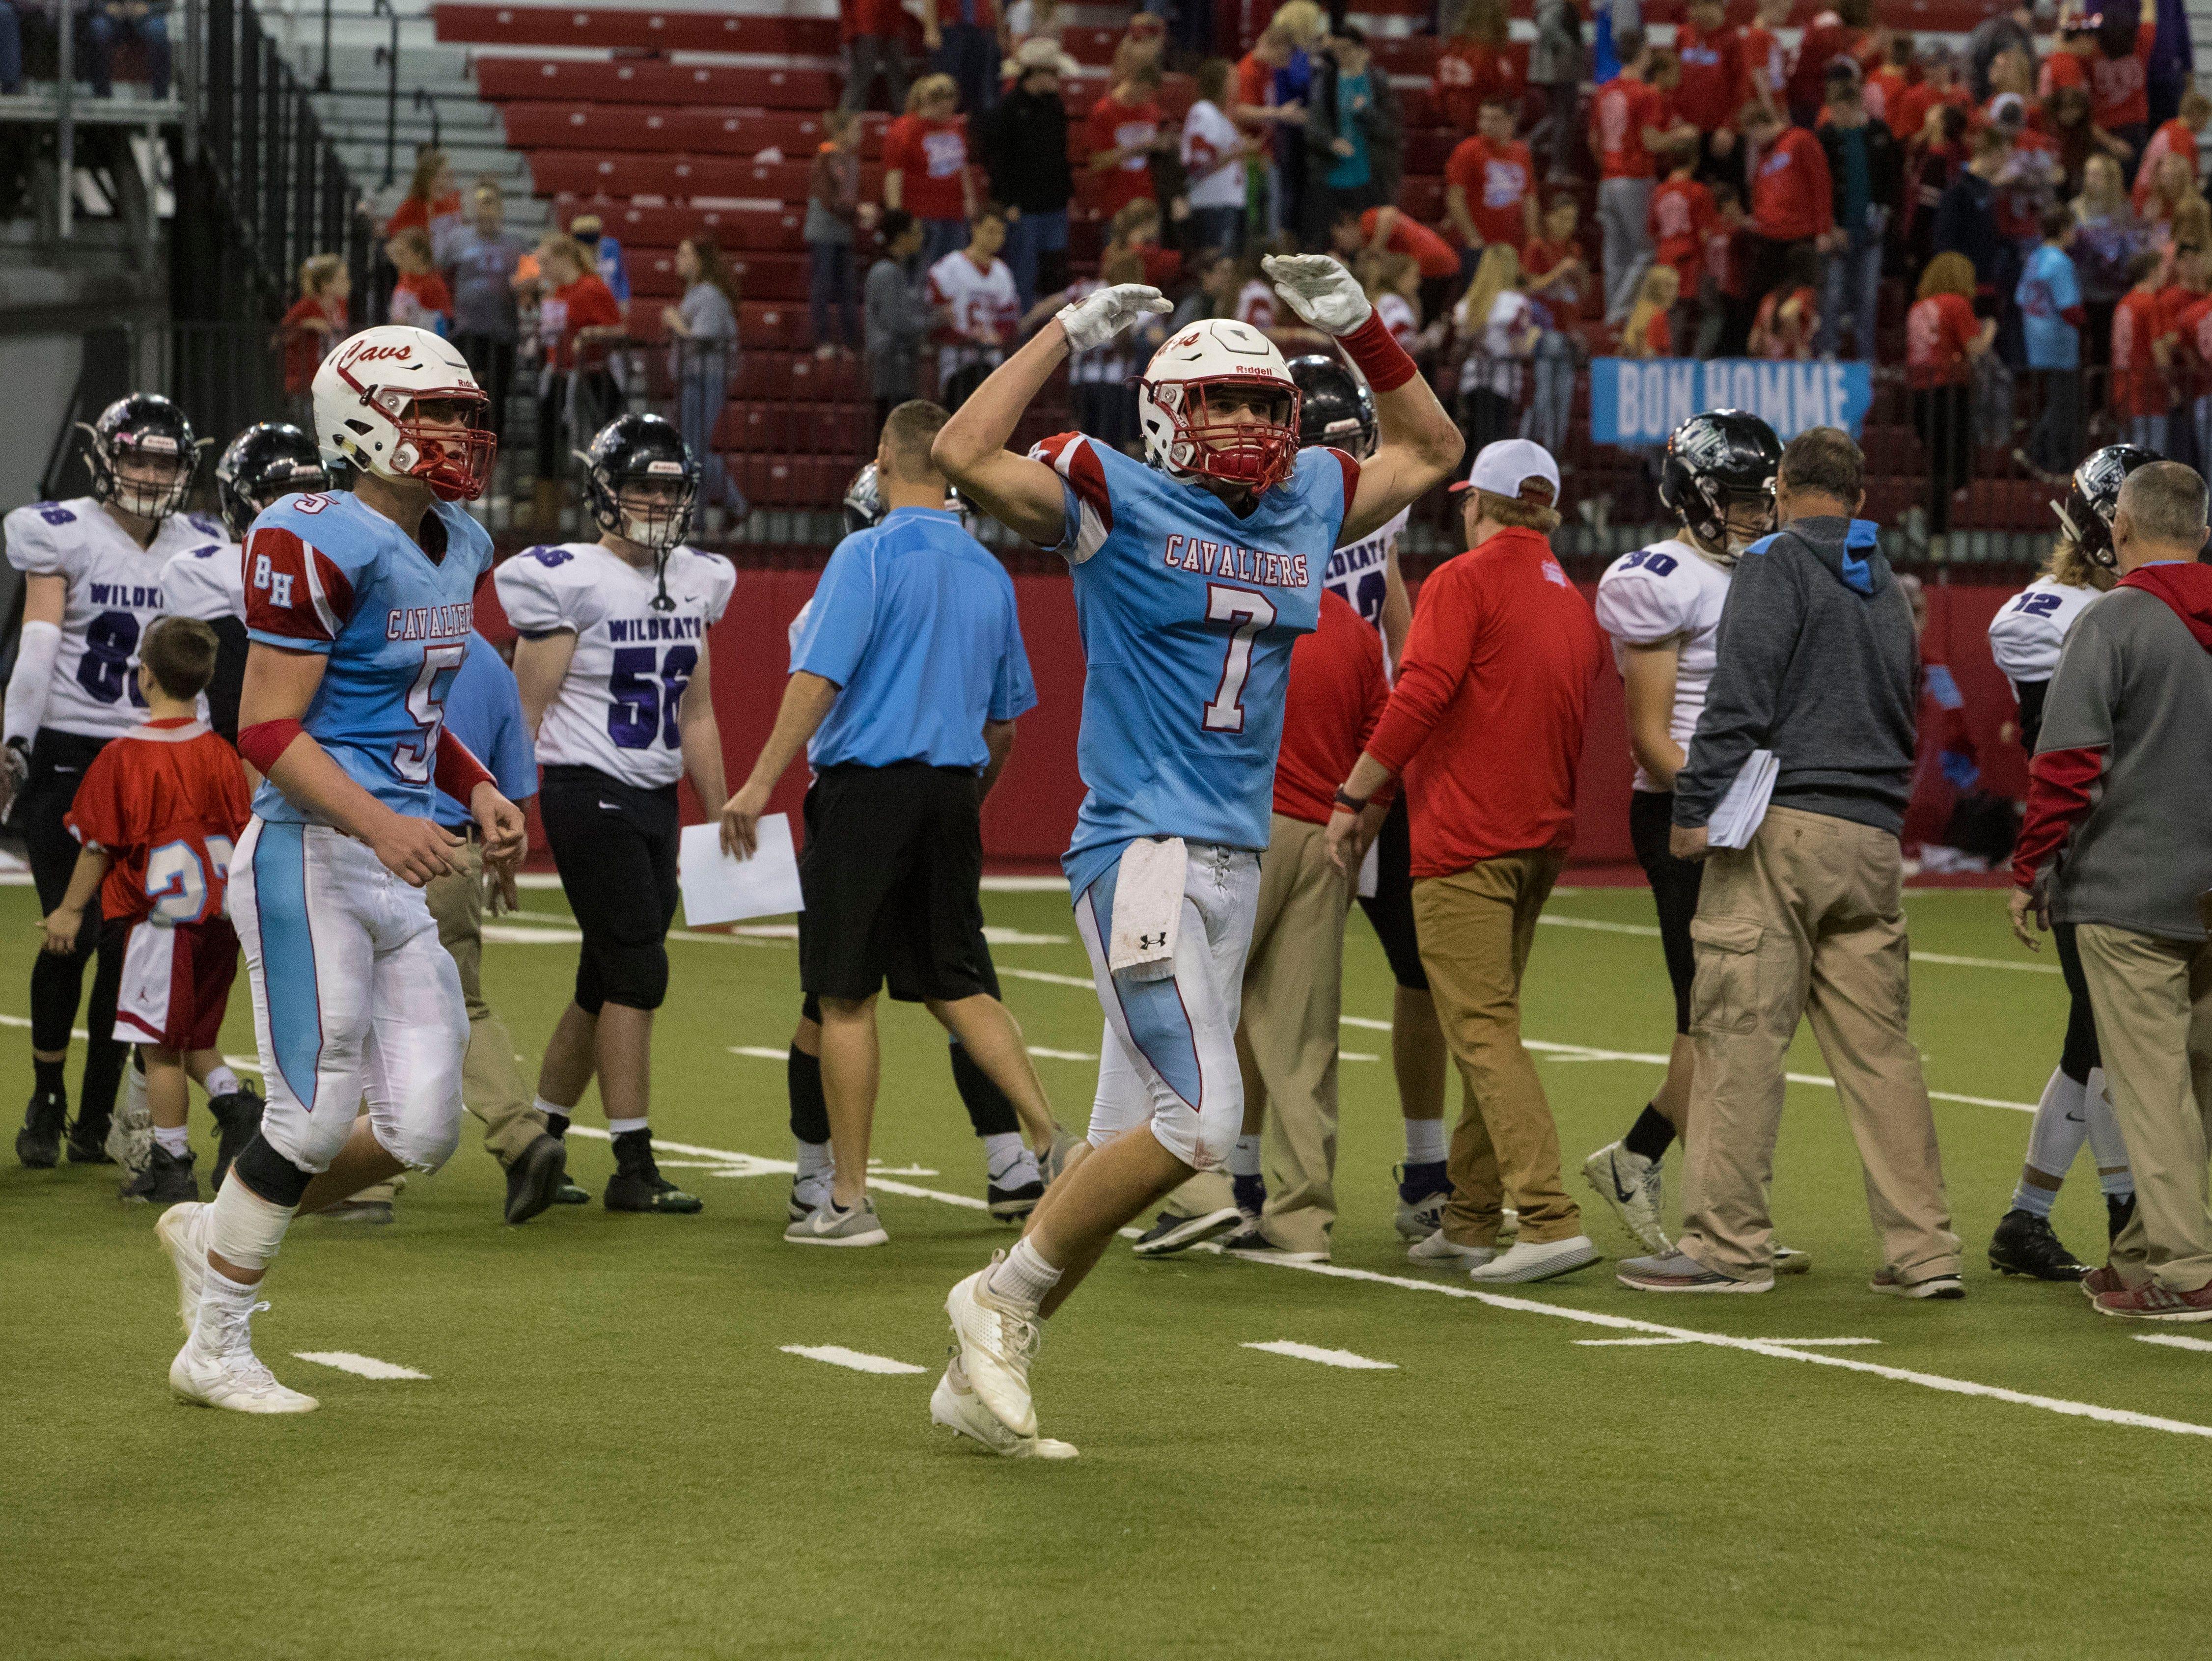 Joey Slama (7) celebrates after Bon Homme wins the class 9AA high school football championship, Thursday, Nov. 8, 2018 at the DakotaDome in Vermillion, S.D.